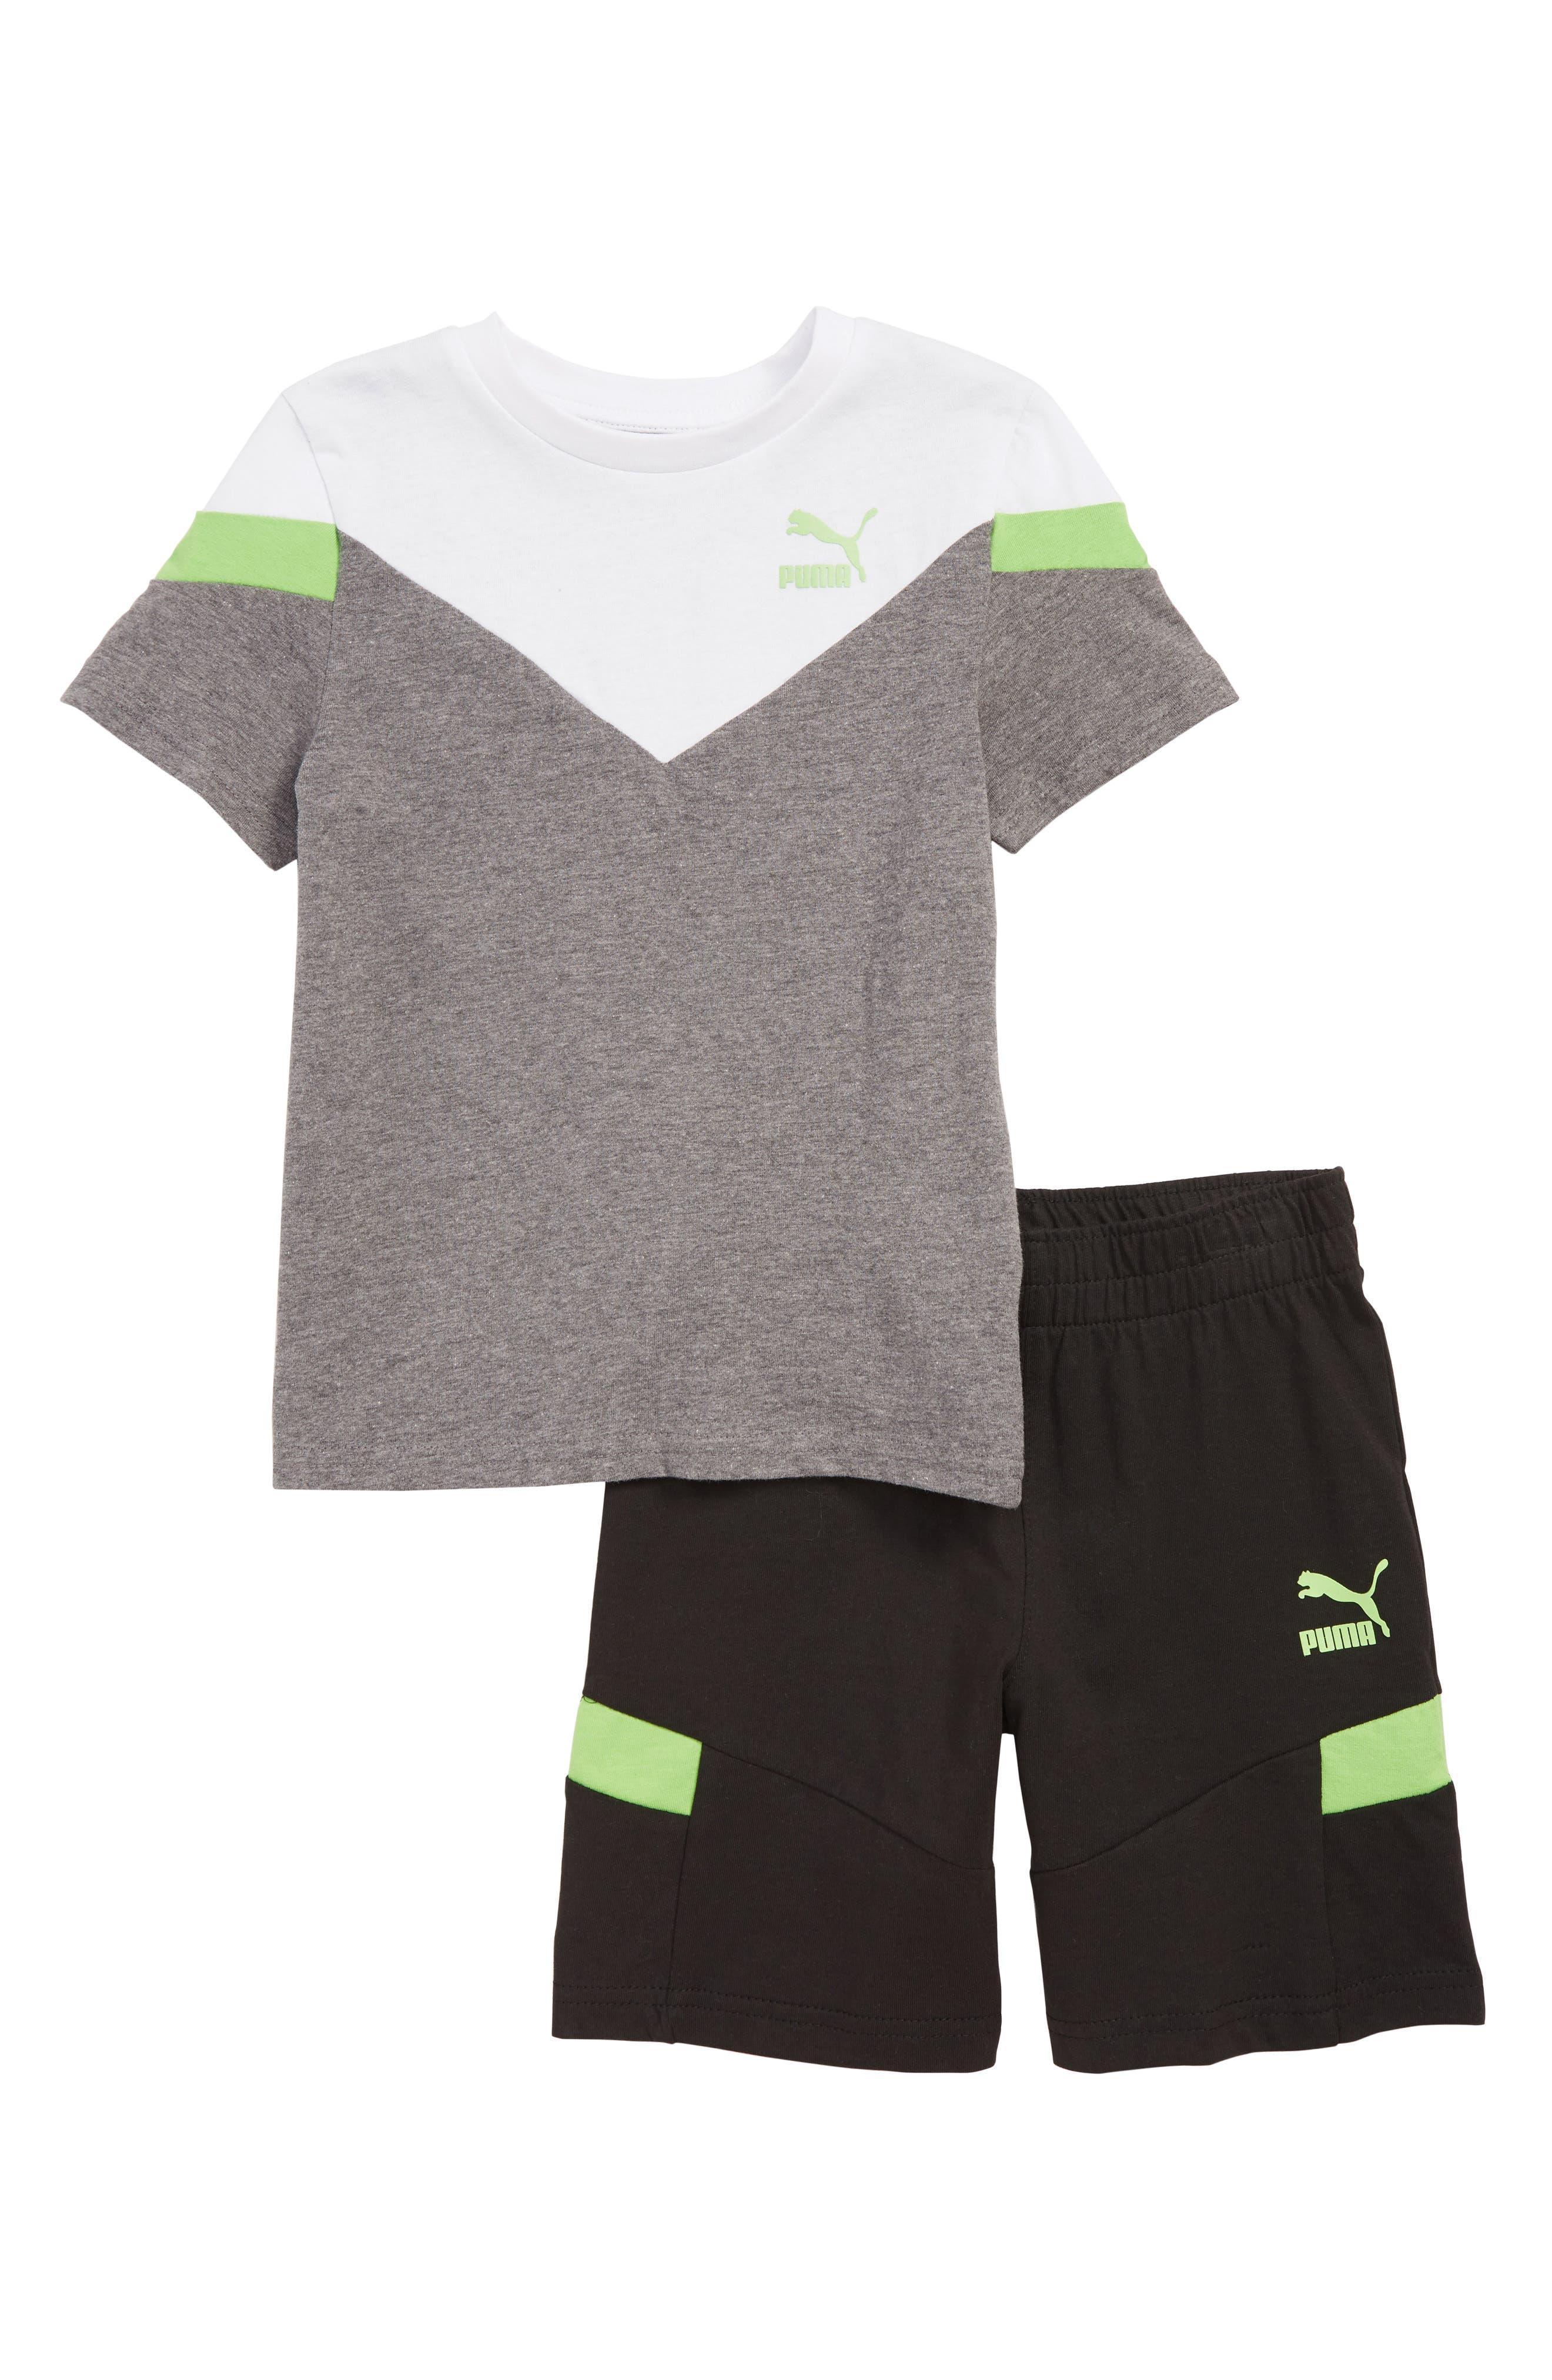 Toddler Boys Puma Colorblock TShirt  Shorts Set